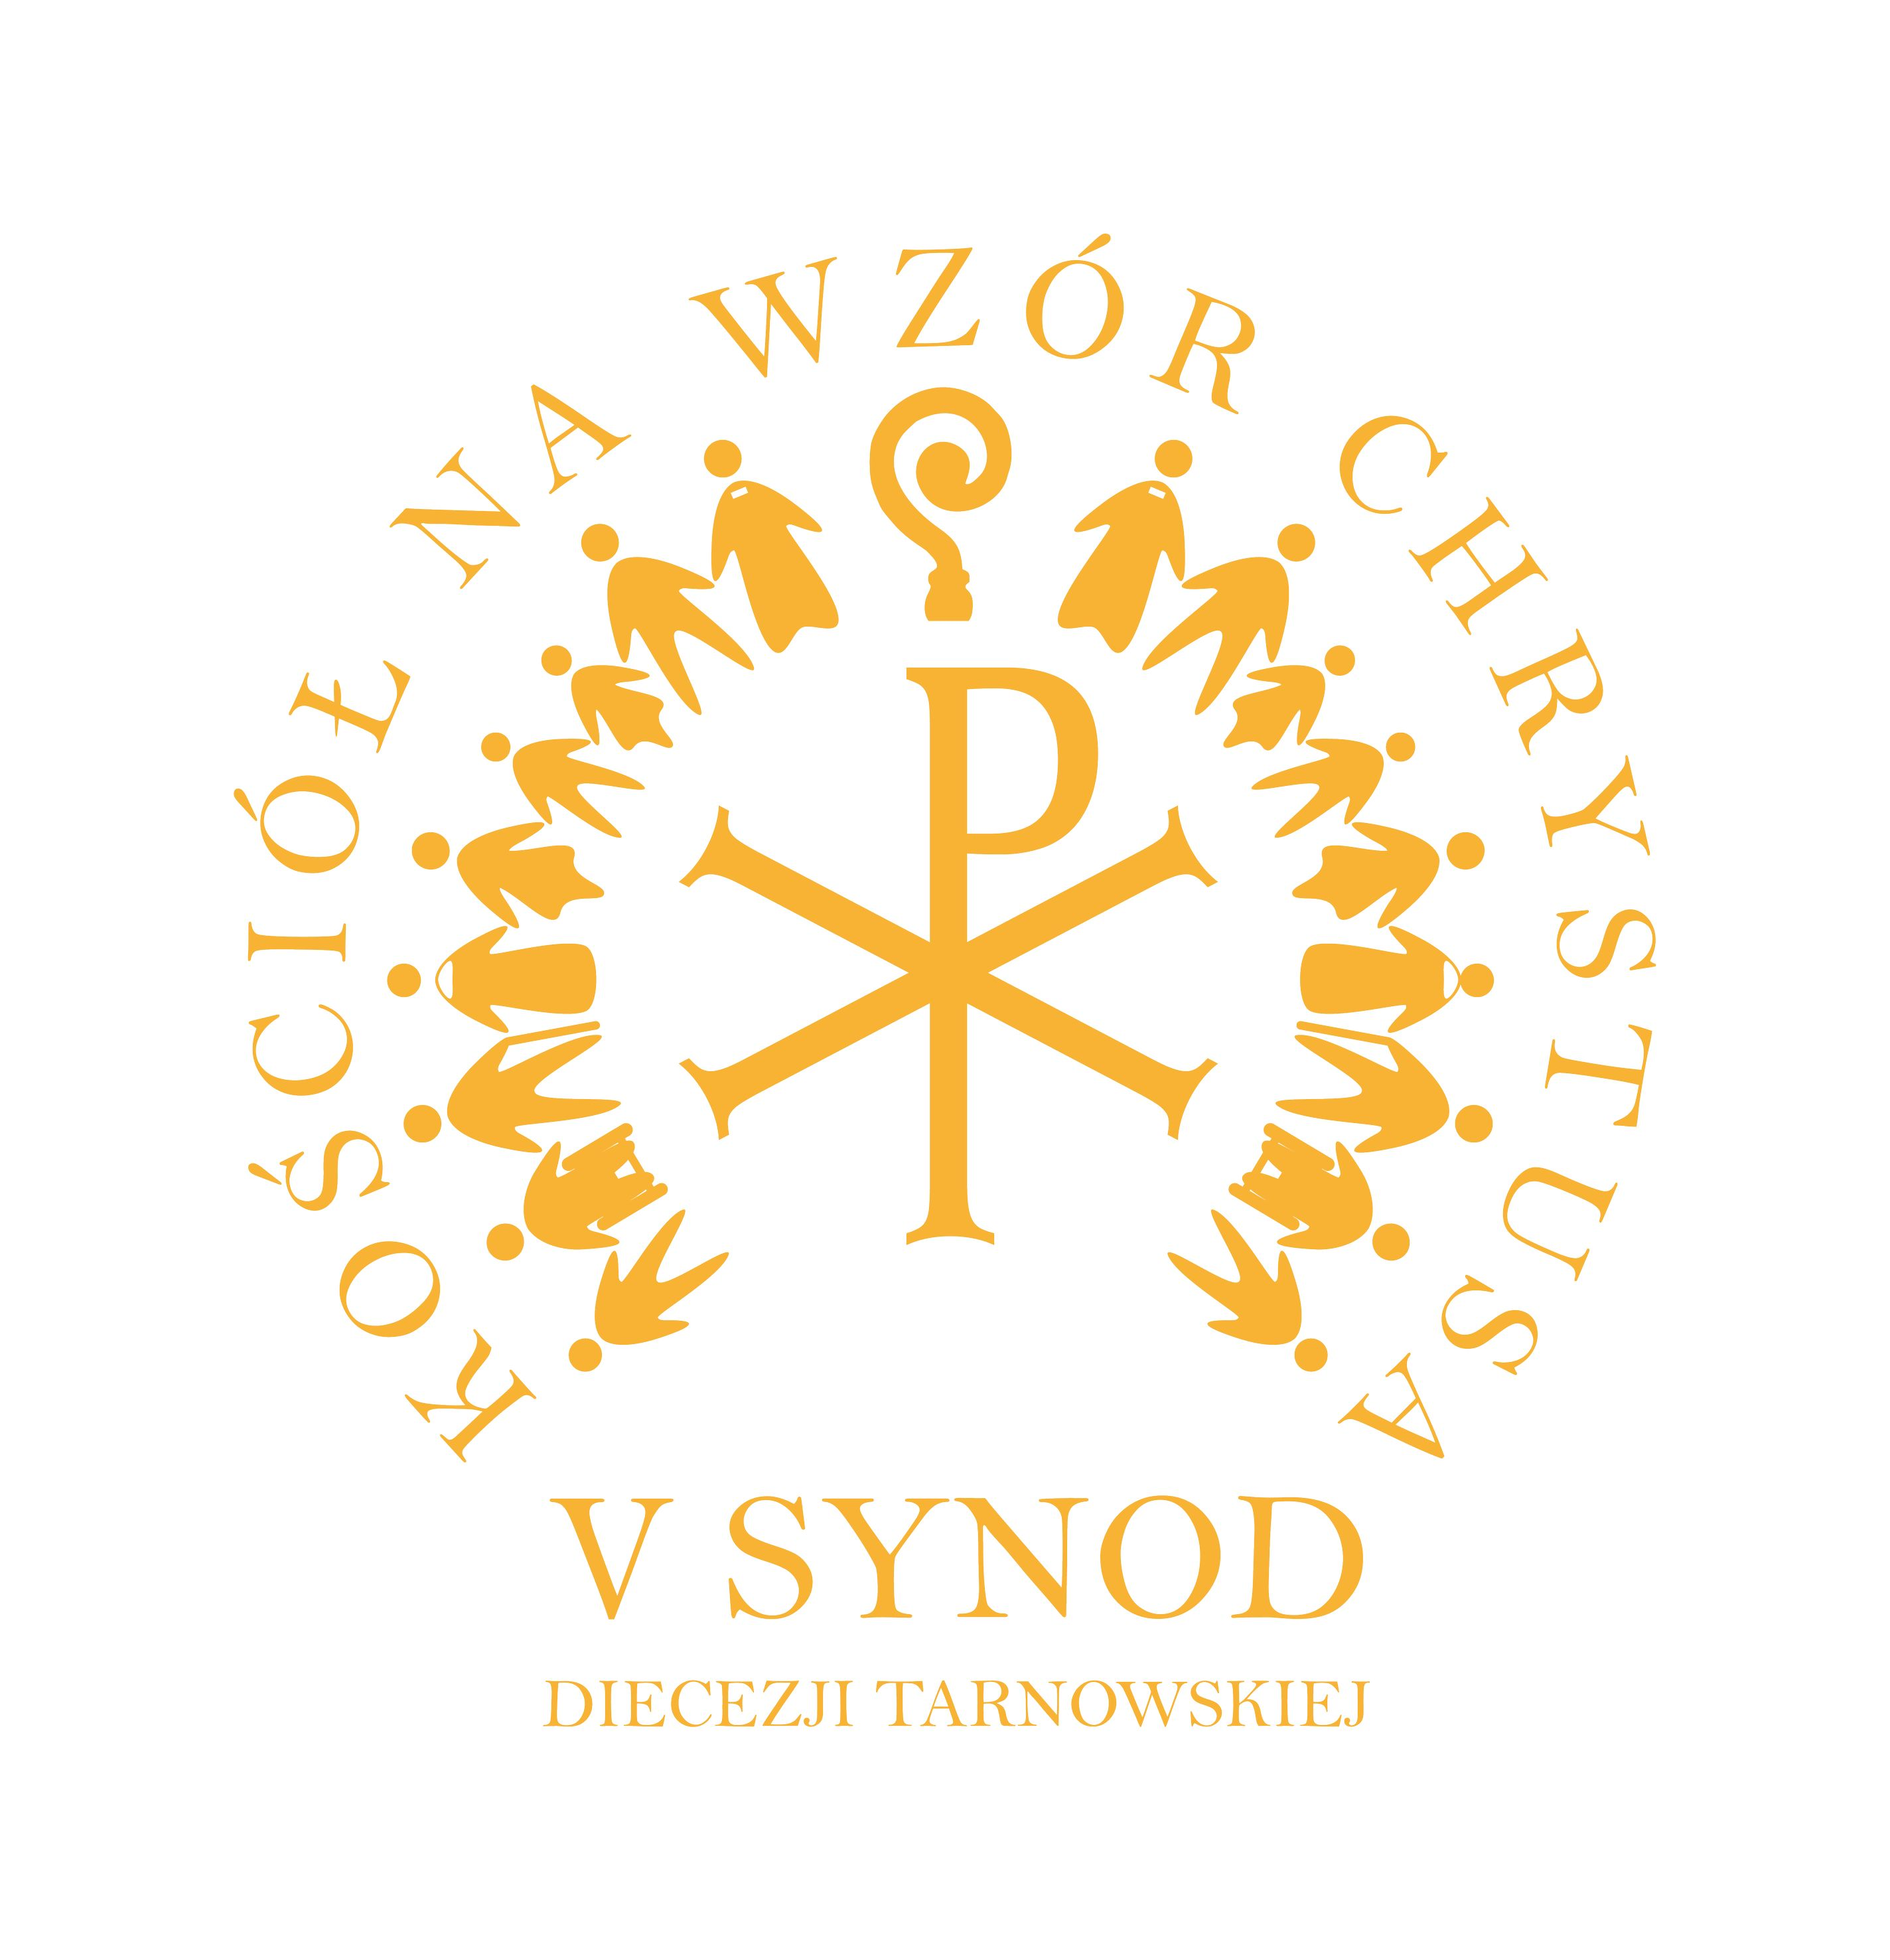 V synod